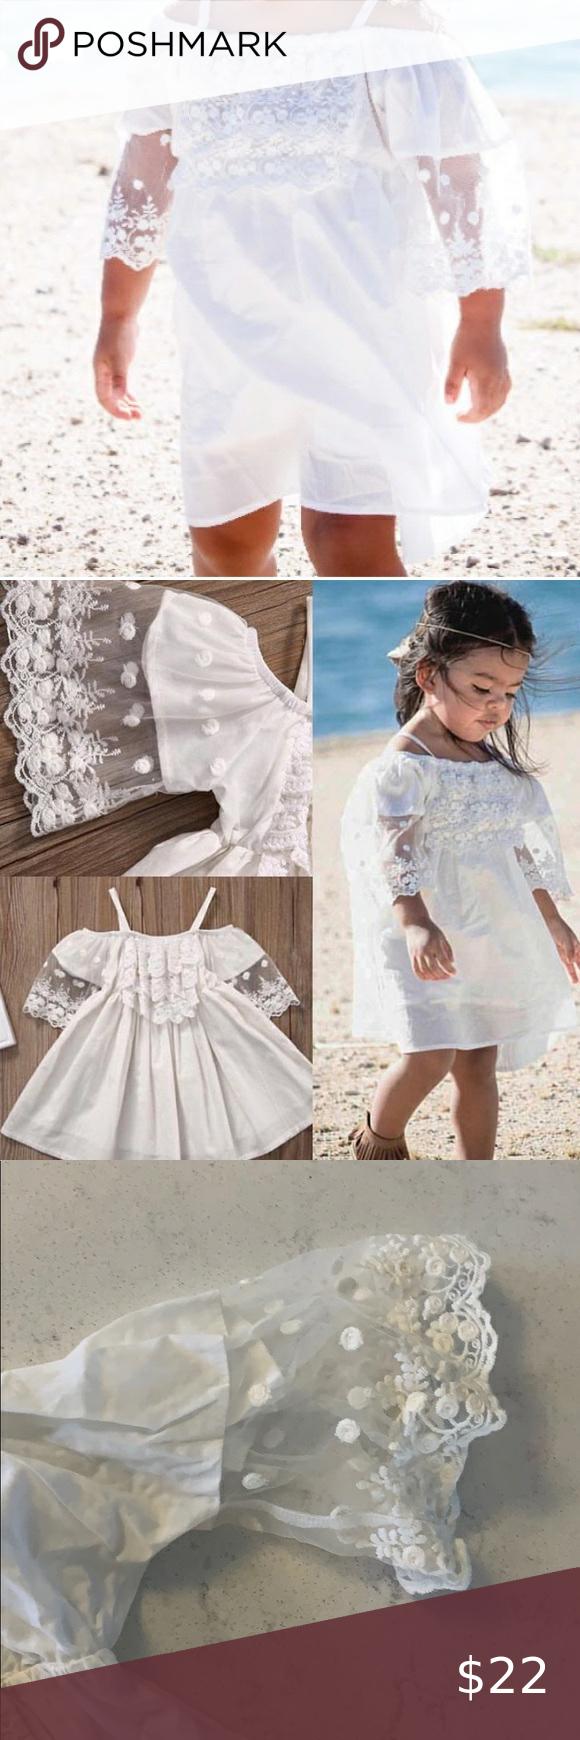 Boho White Lace Dress 3t White Lace Dress Boho Lace Dress Boho Lace White Dress [ 1740 x 580 Pixel ]